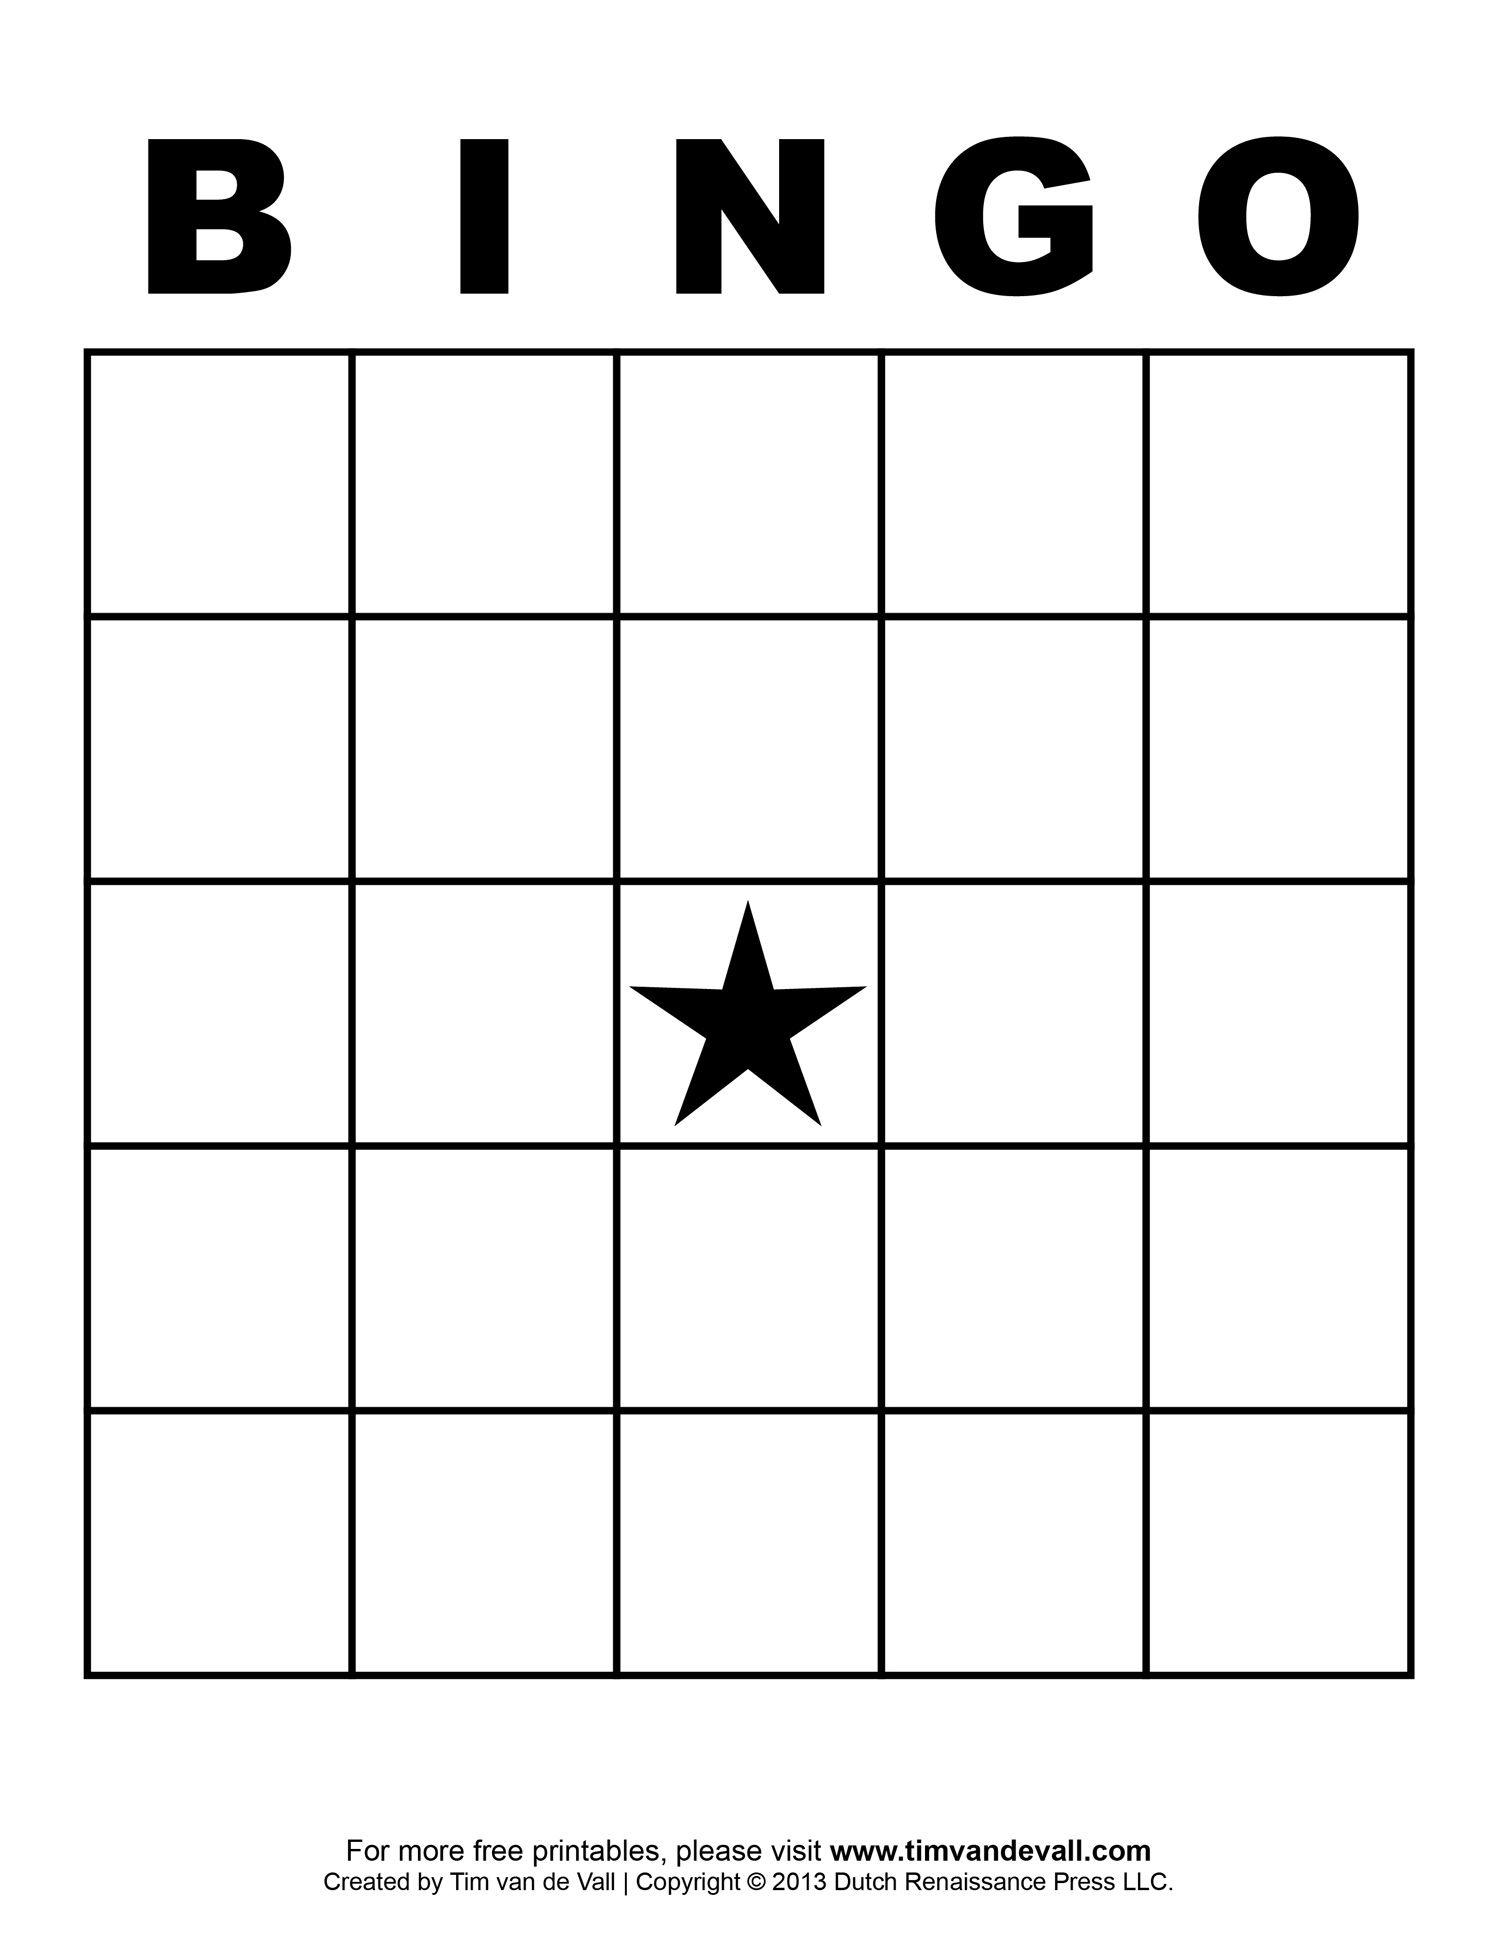 Free Printable Blank Bingo Cards Template 4 X 4   Classroom   Sight - Free Printable Blank Bingo Cards